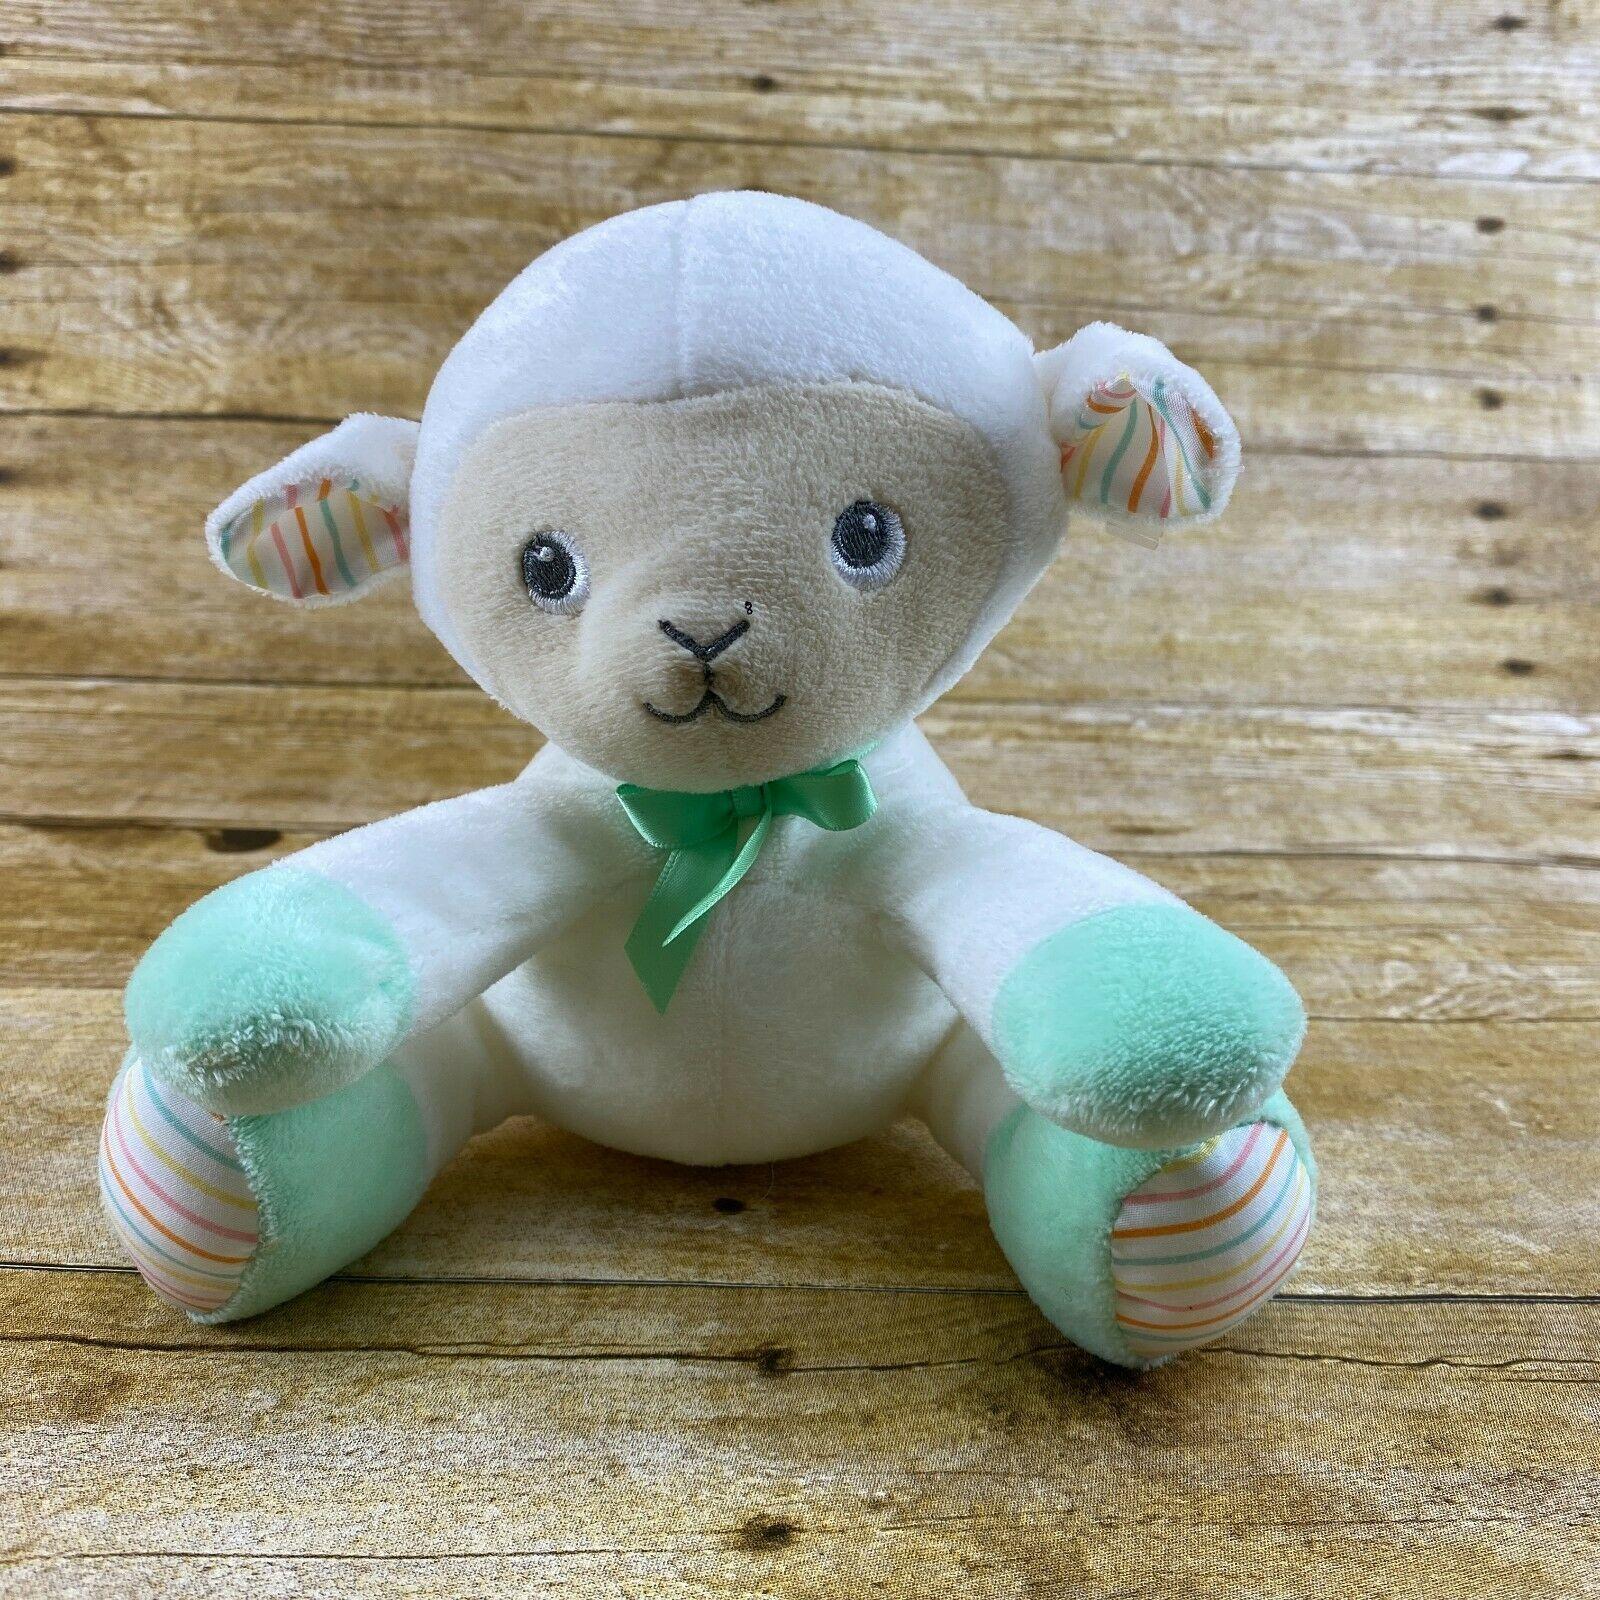 "MAGIC YEARS Plush 5.5"" Lamb Baby Stuffed Animal Lovey 2017 - $12.99"